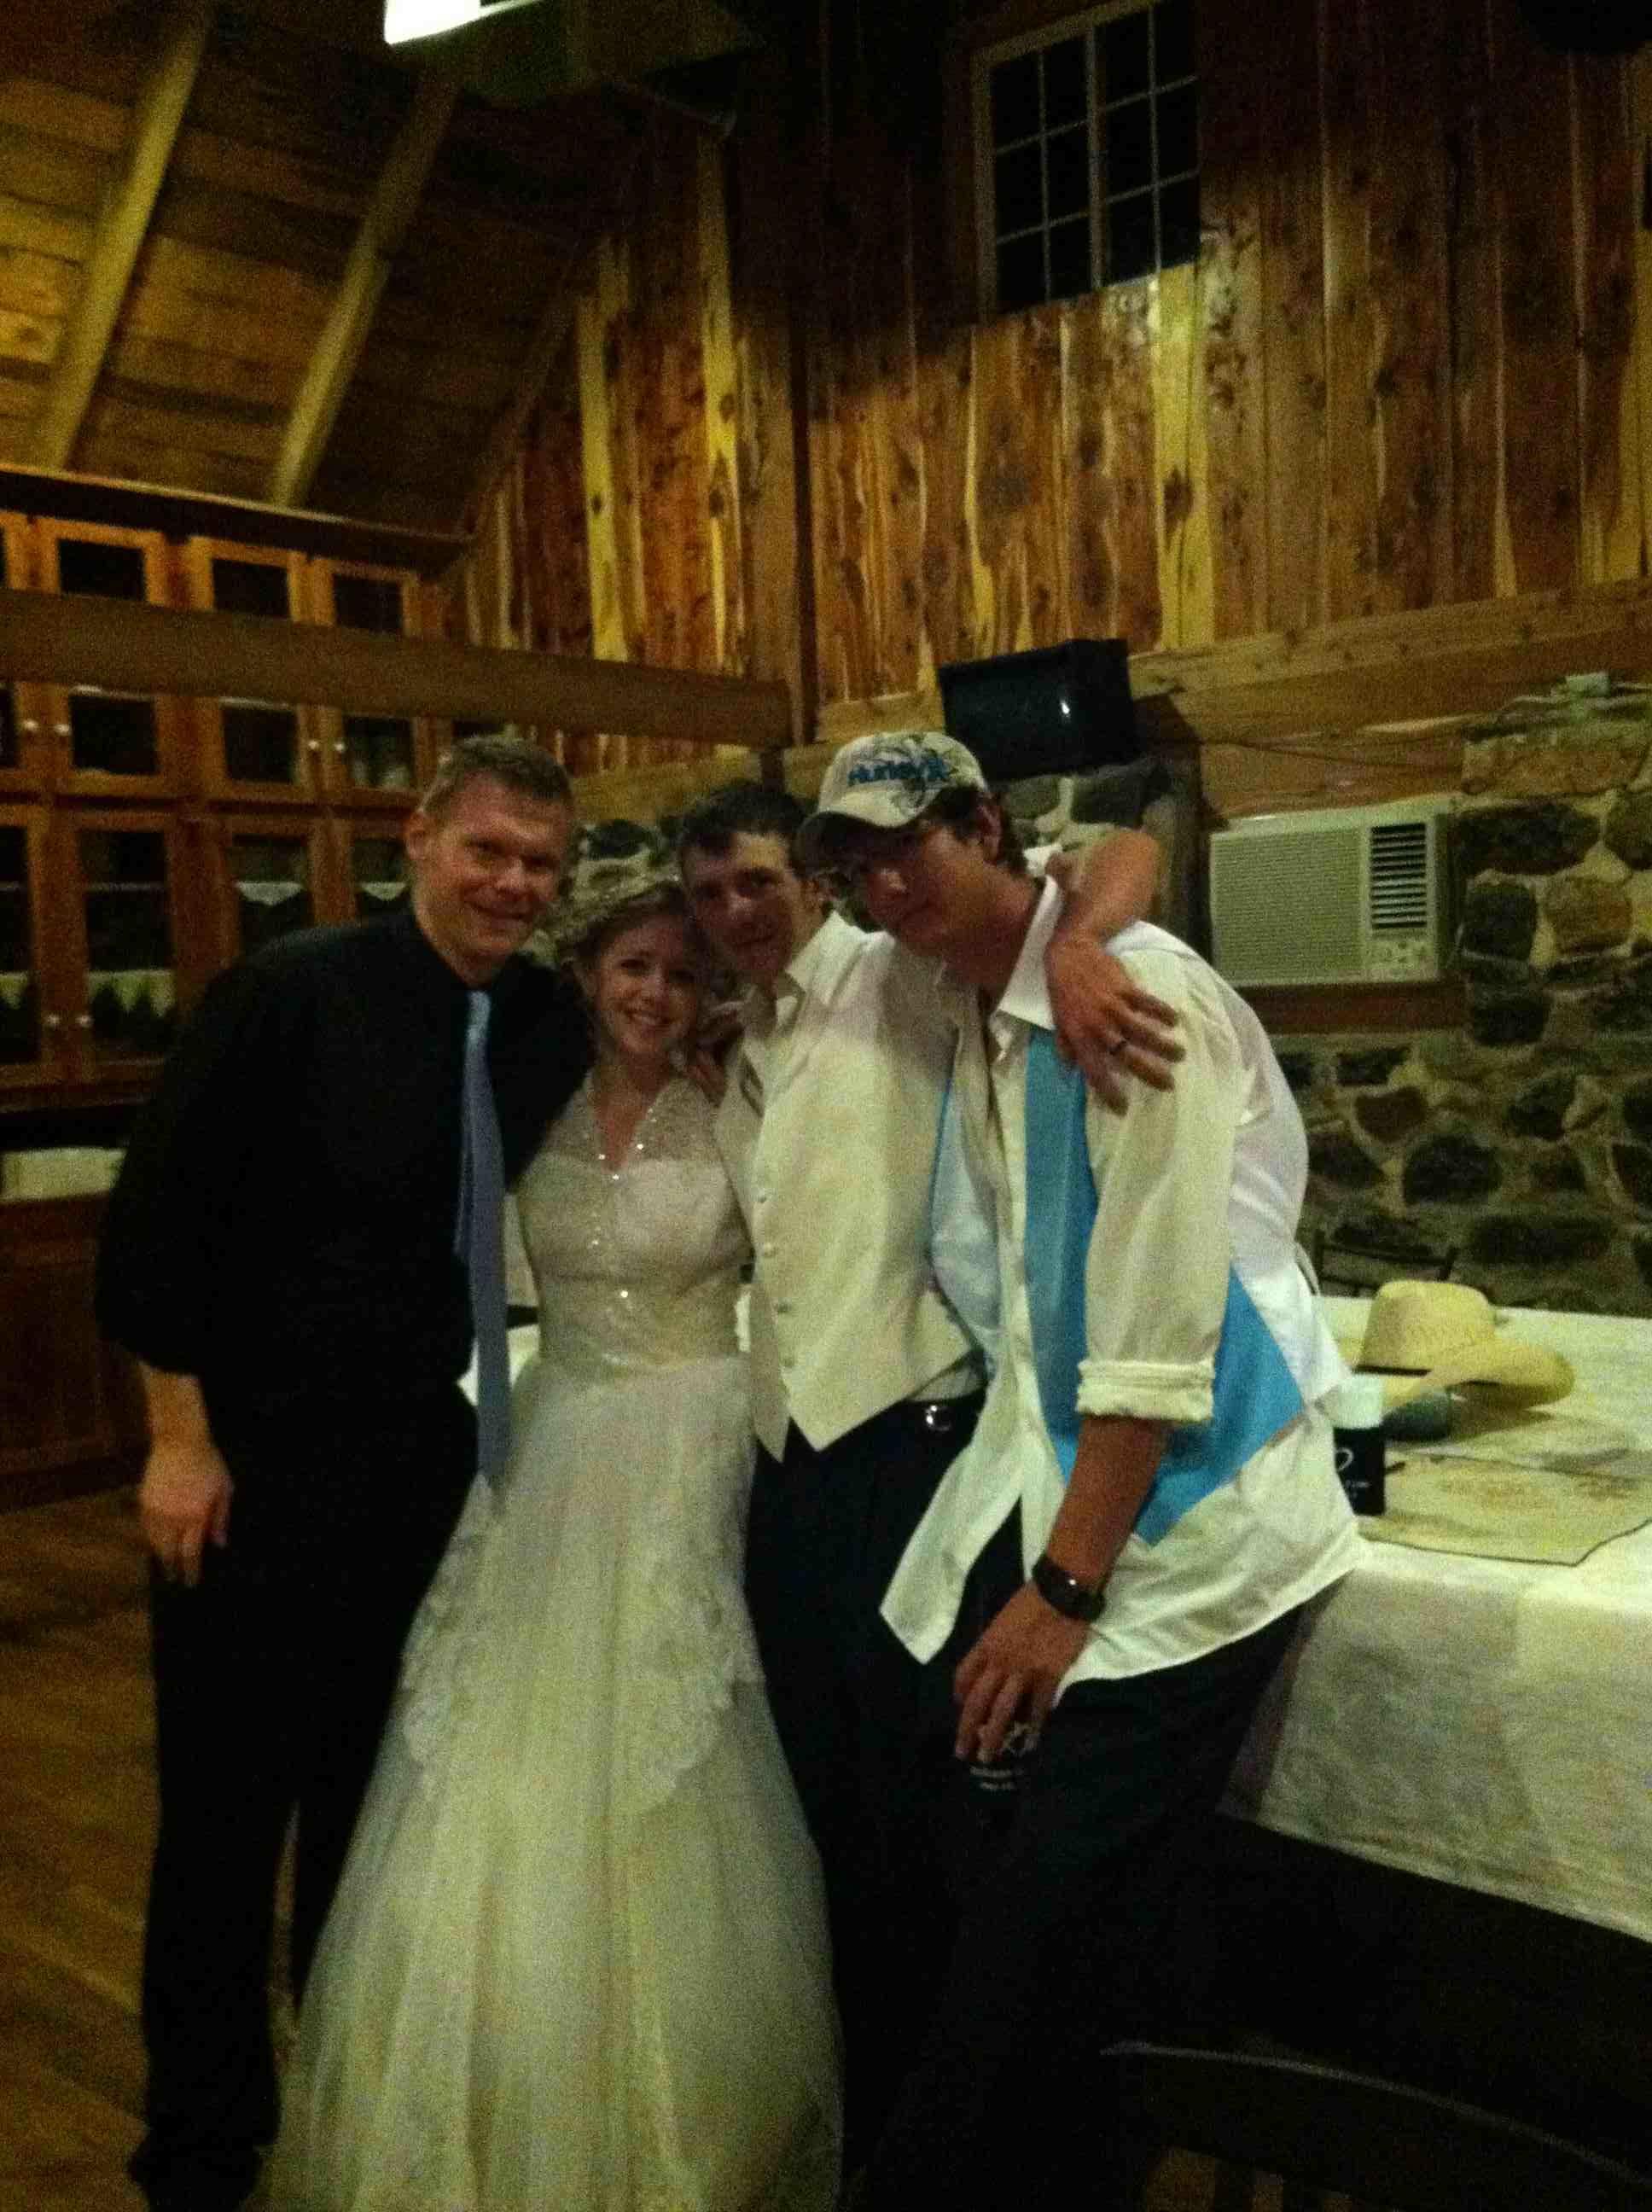 Brian Kelm - Master of Ceremonies, Performer, Wedding DJ, Creative Wedding Planner & Custom Wedding Designer